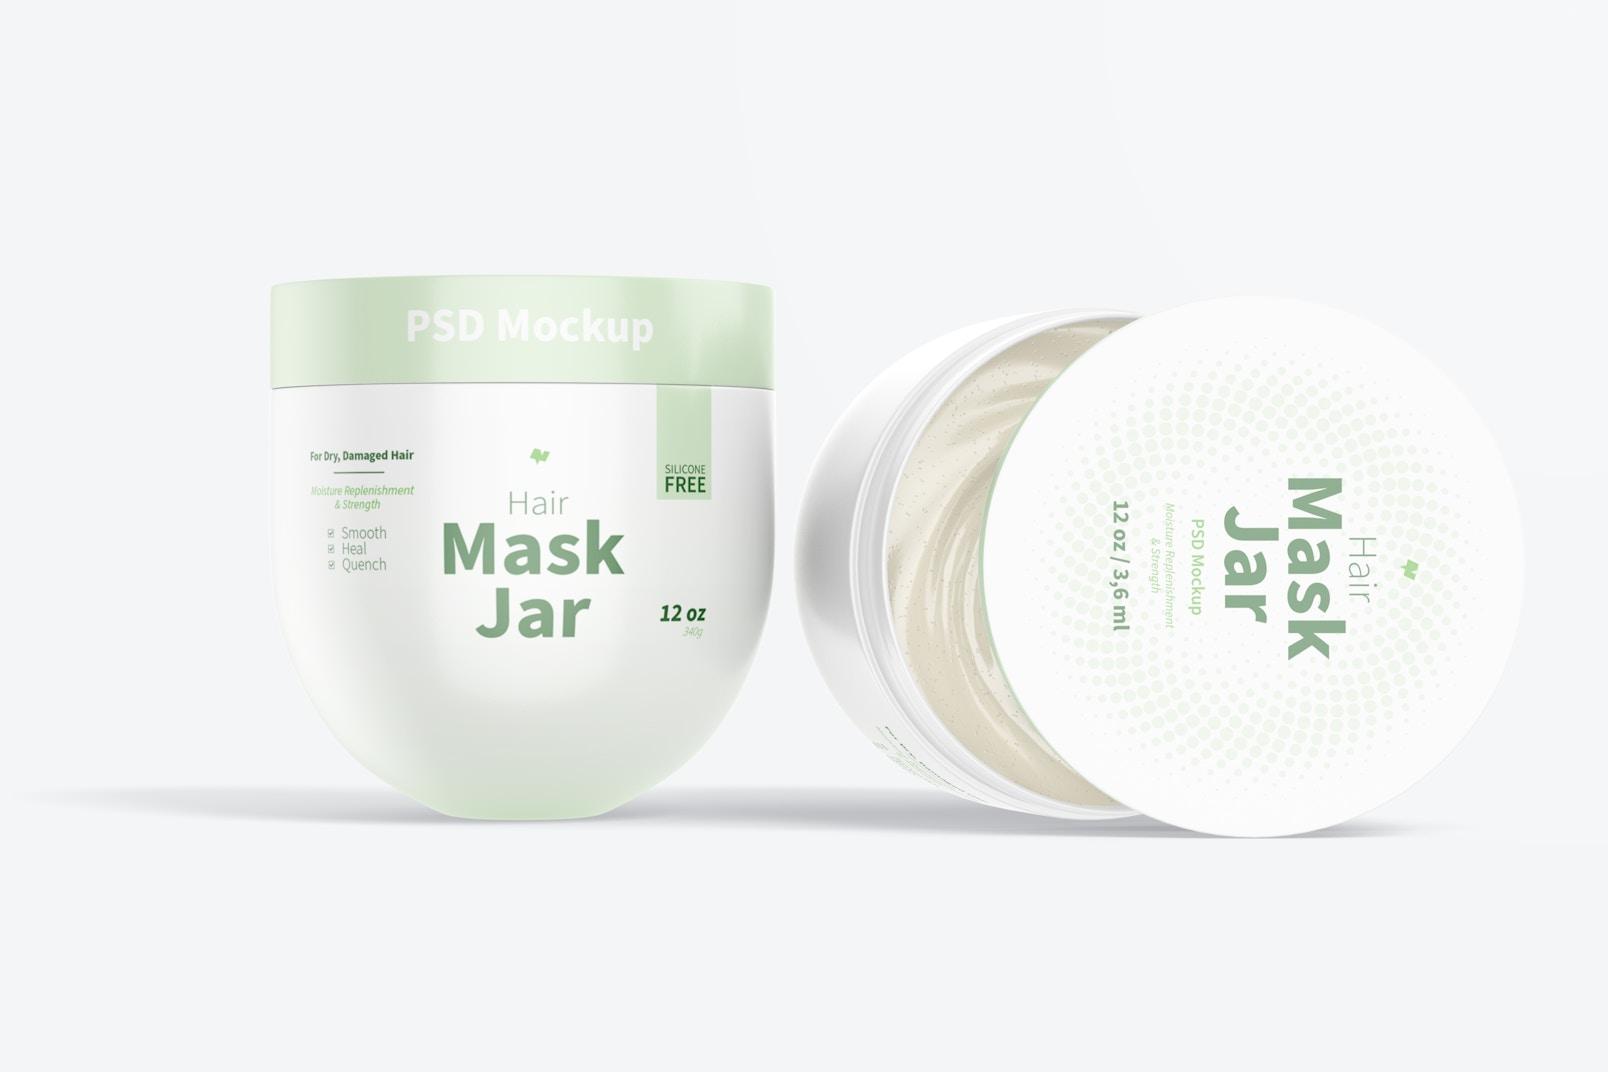 Hair Mask Jars Mockup, Opened and Closed